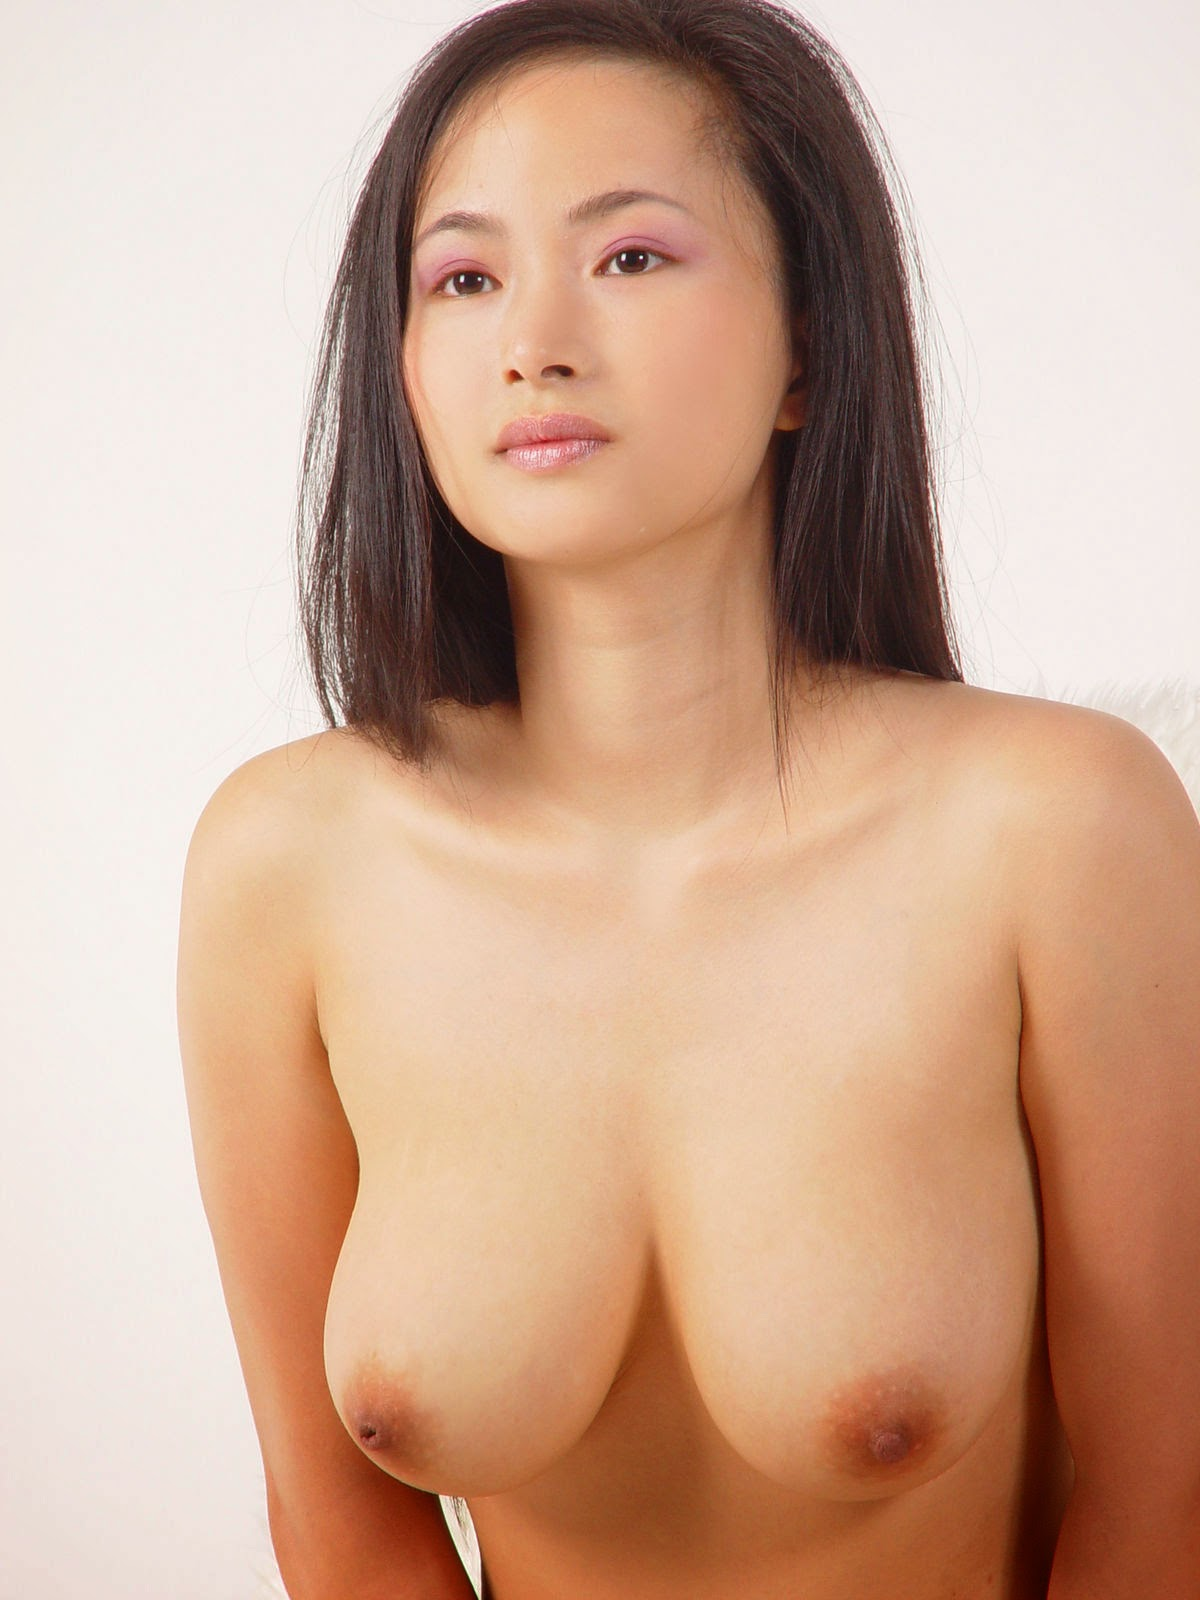 Consider, that Tang jia li nude